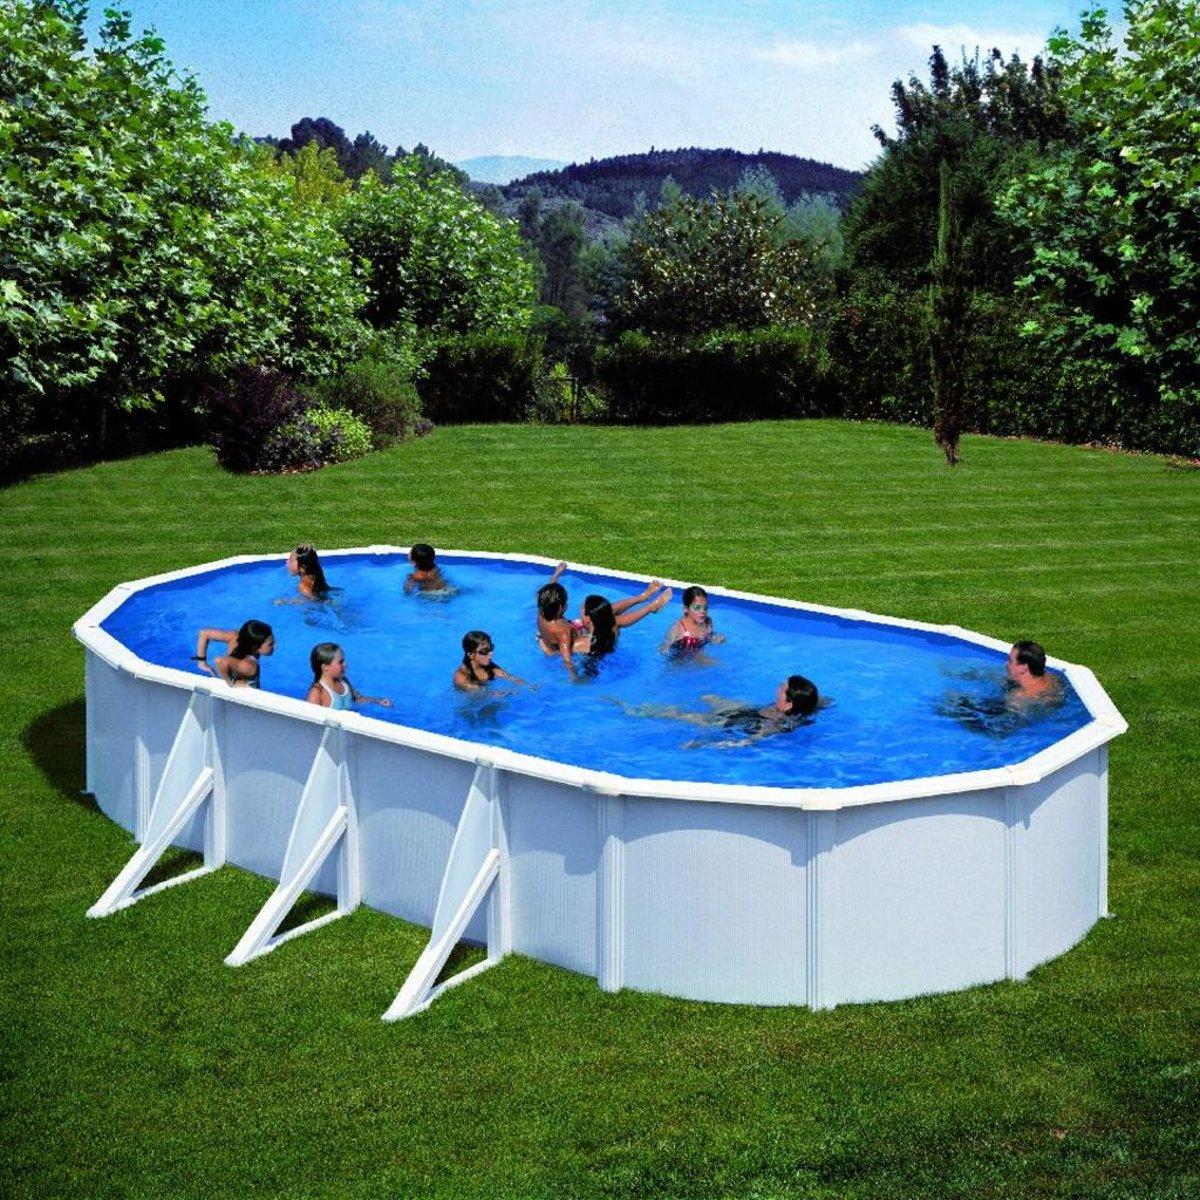 San Marina Pools Zwembad Zwembad Ovaal Fidji 005 s